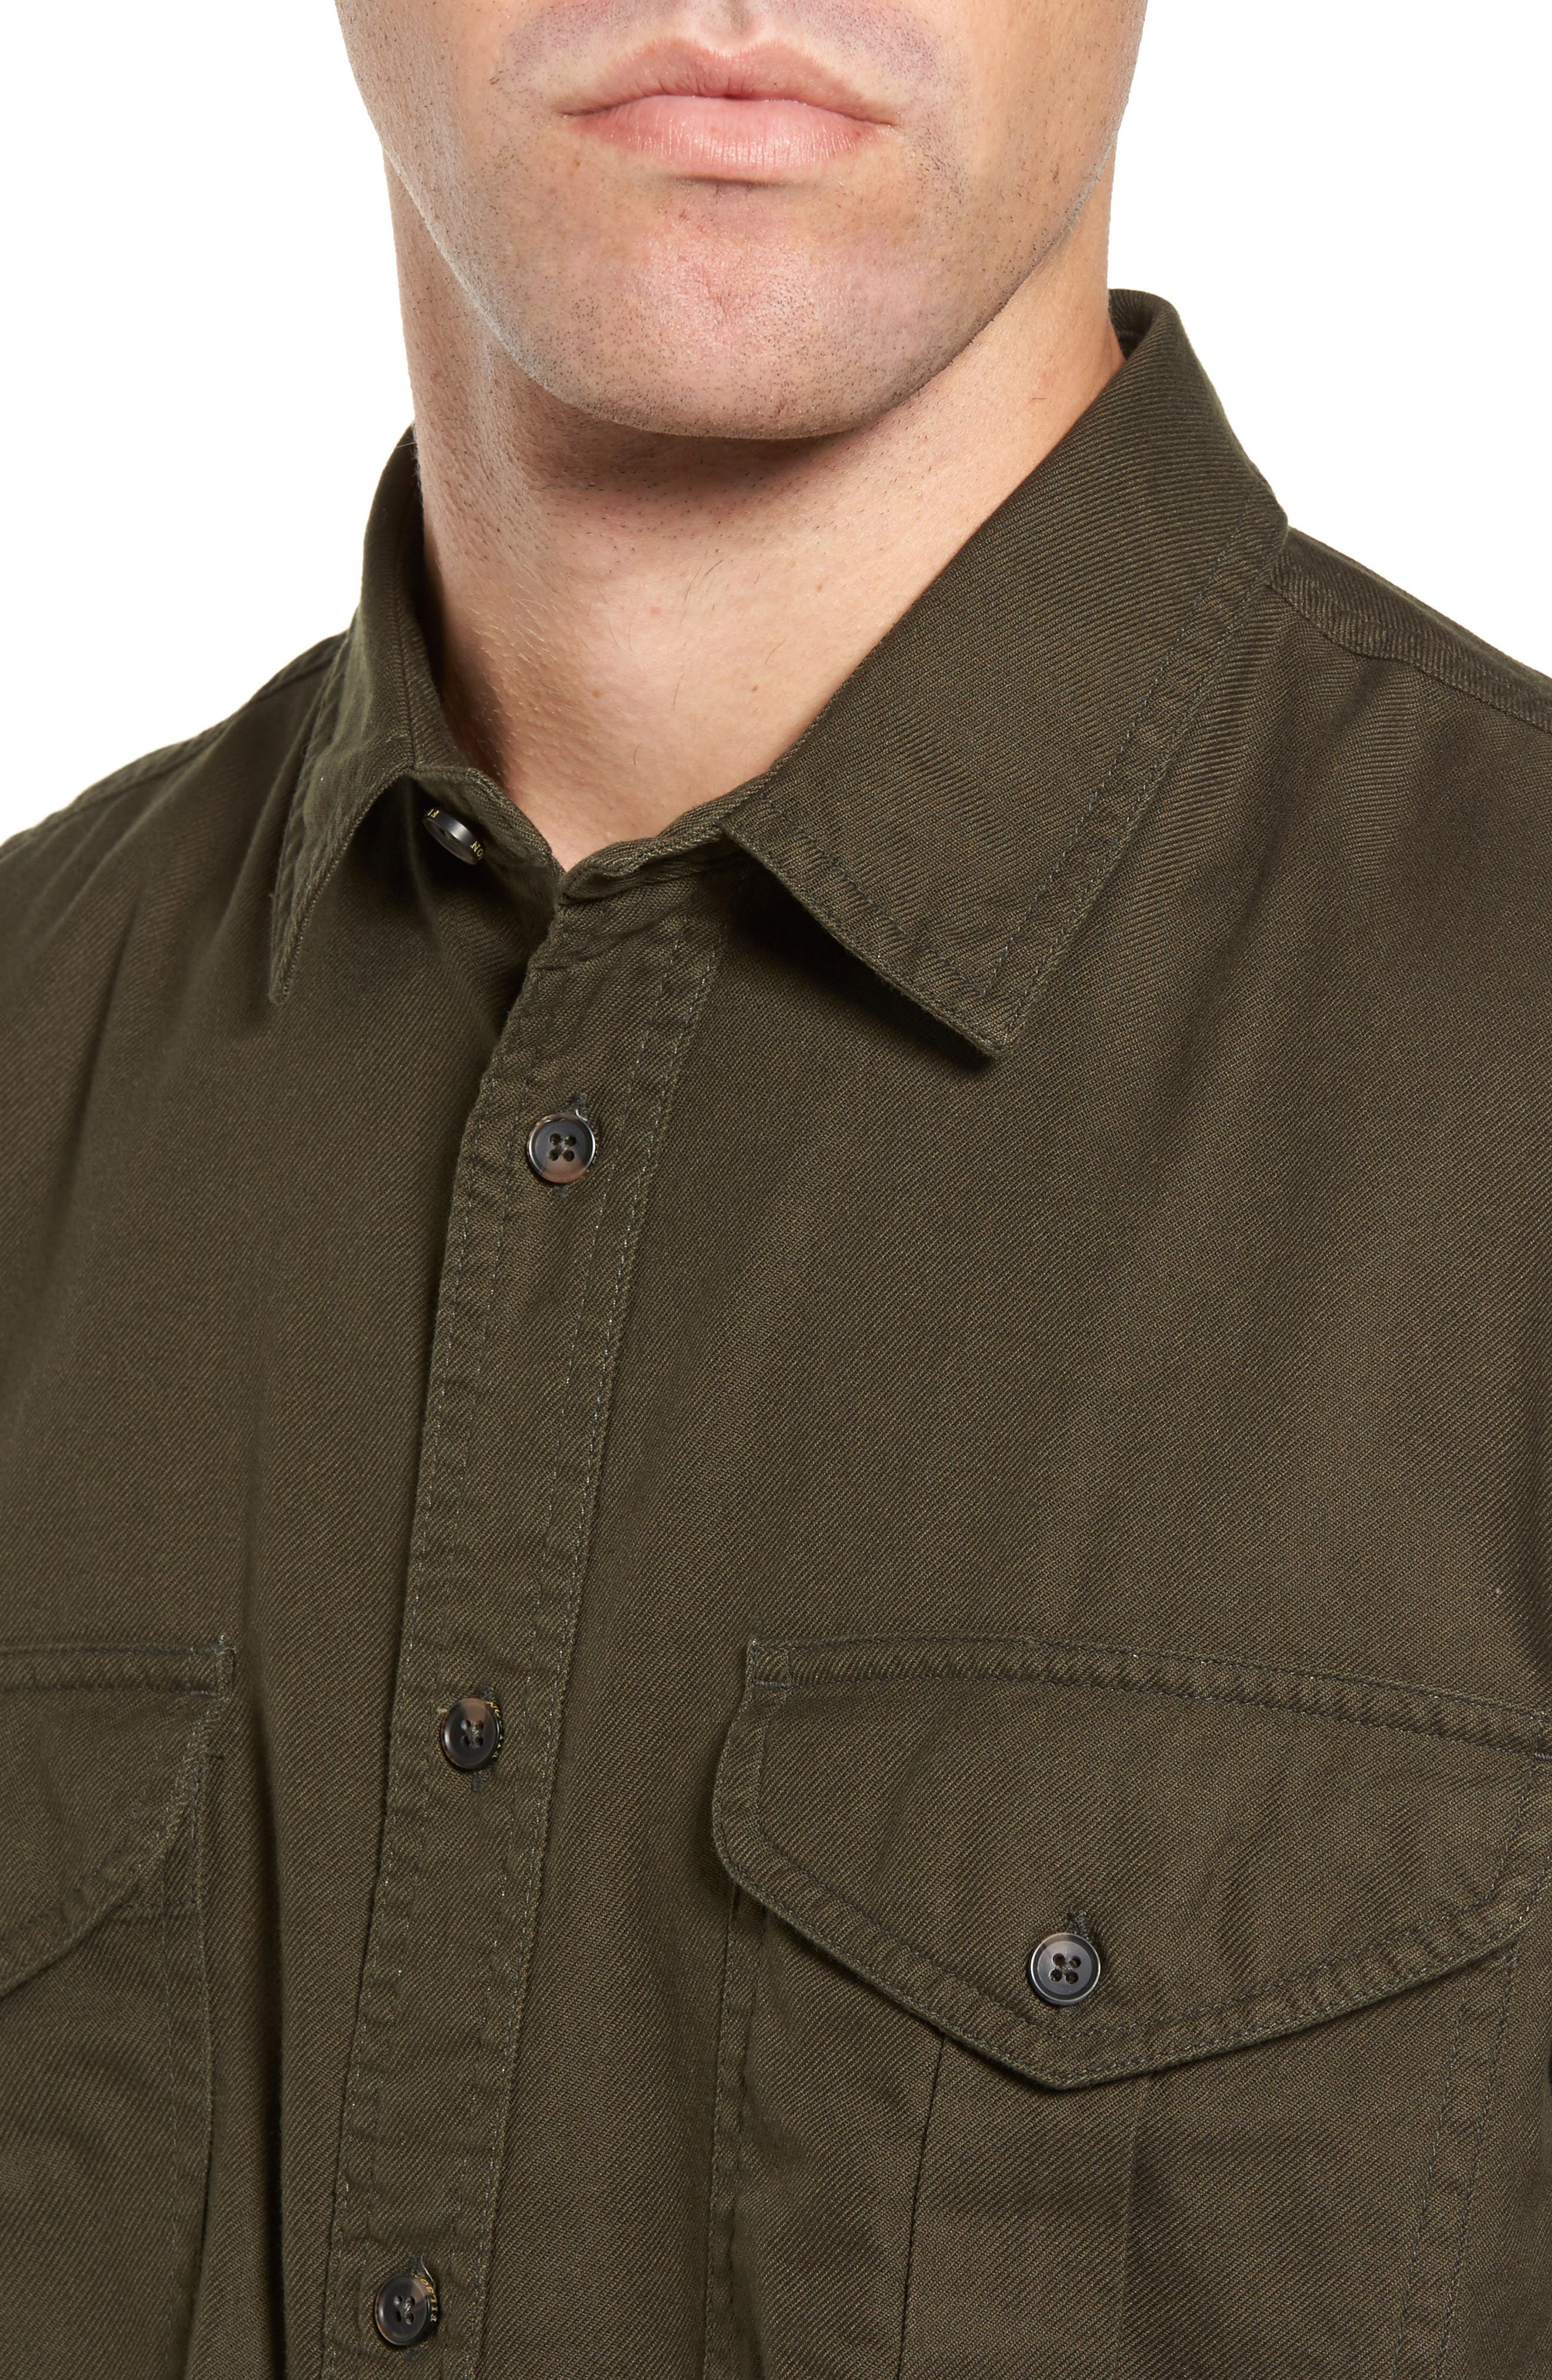 Alaskan Guide Regular Fit Twill Shirt,                             Alternate thumbnail 4, color,                             Brunswick Green